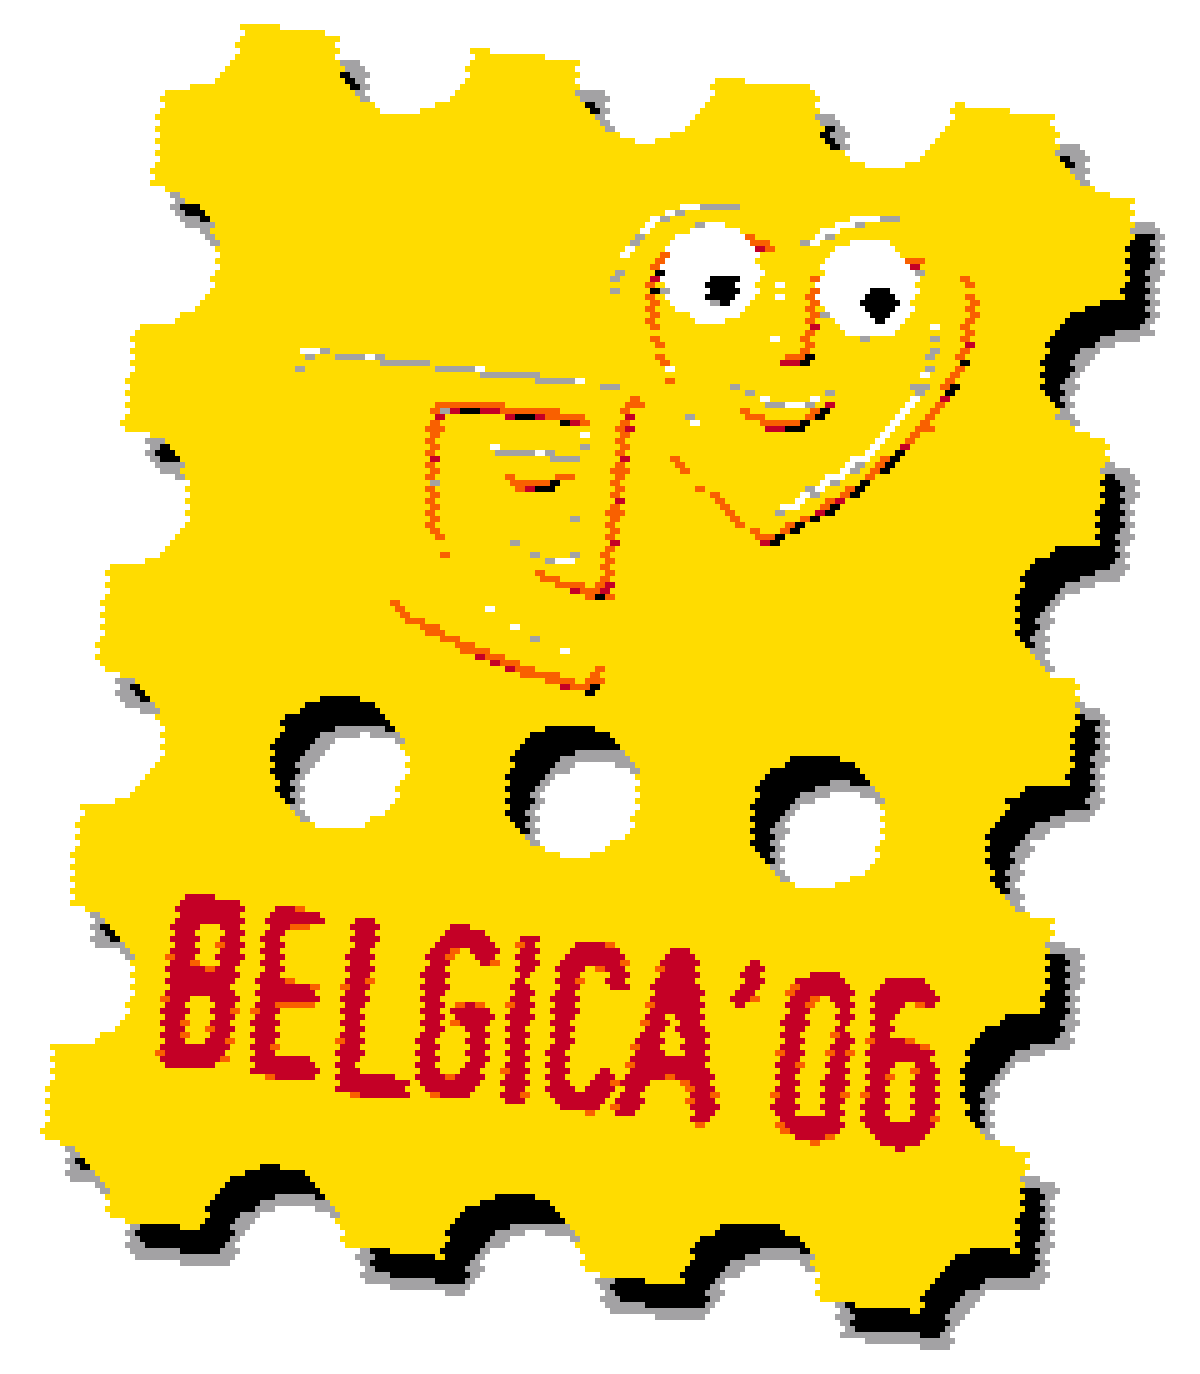 Belgica 2006